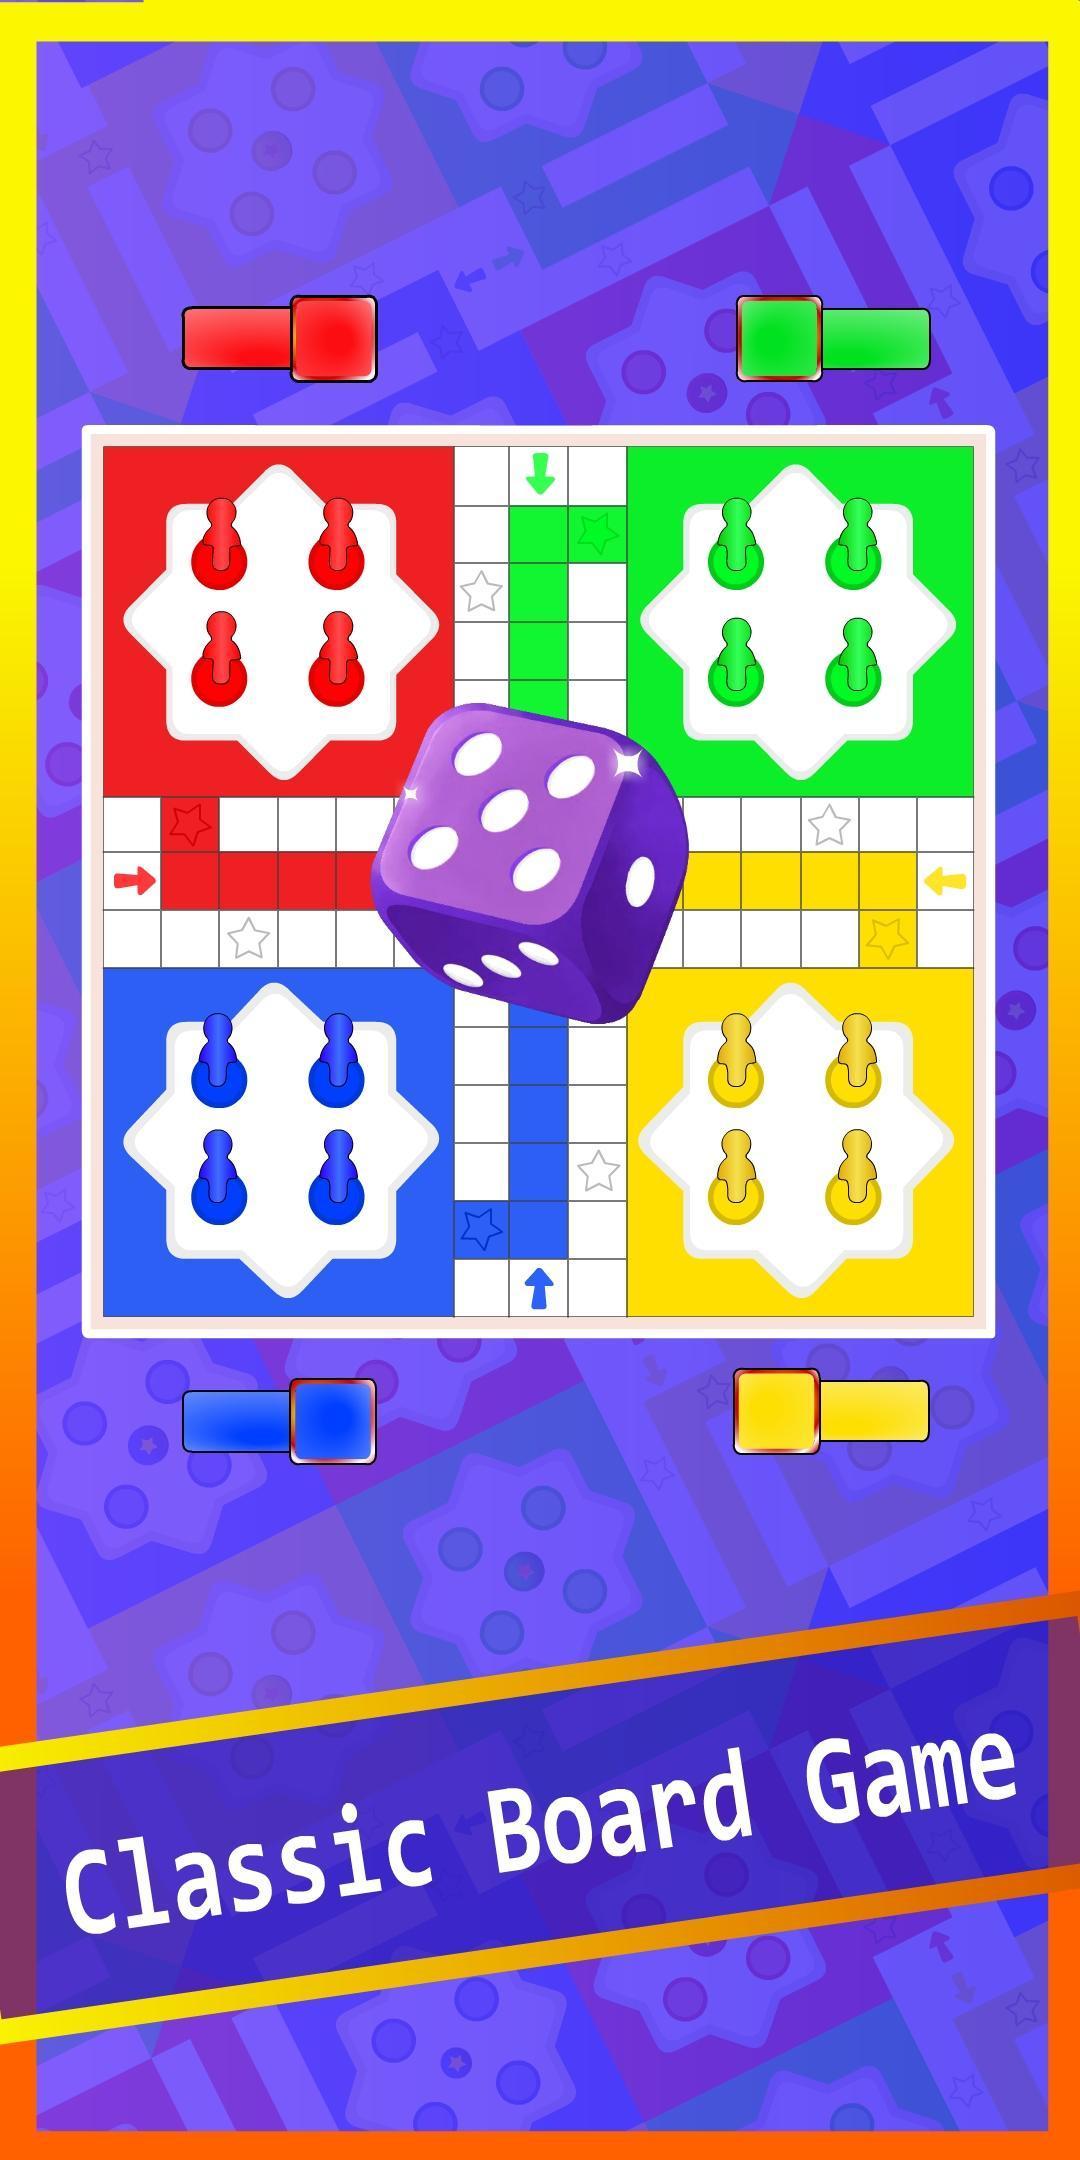 Ludo Club - Ludo Classic - King of Board Games 👑 1.5 Screenshot 3